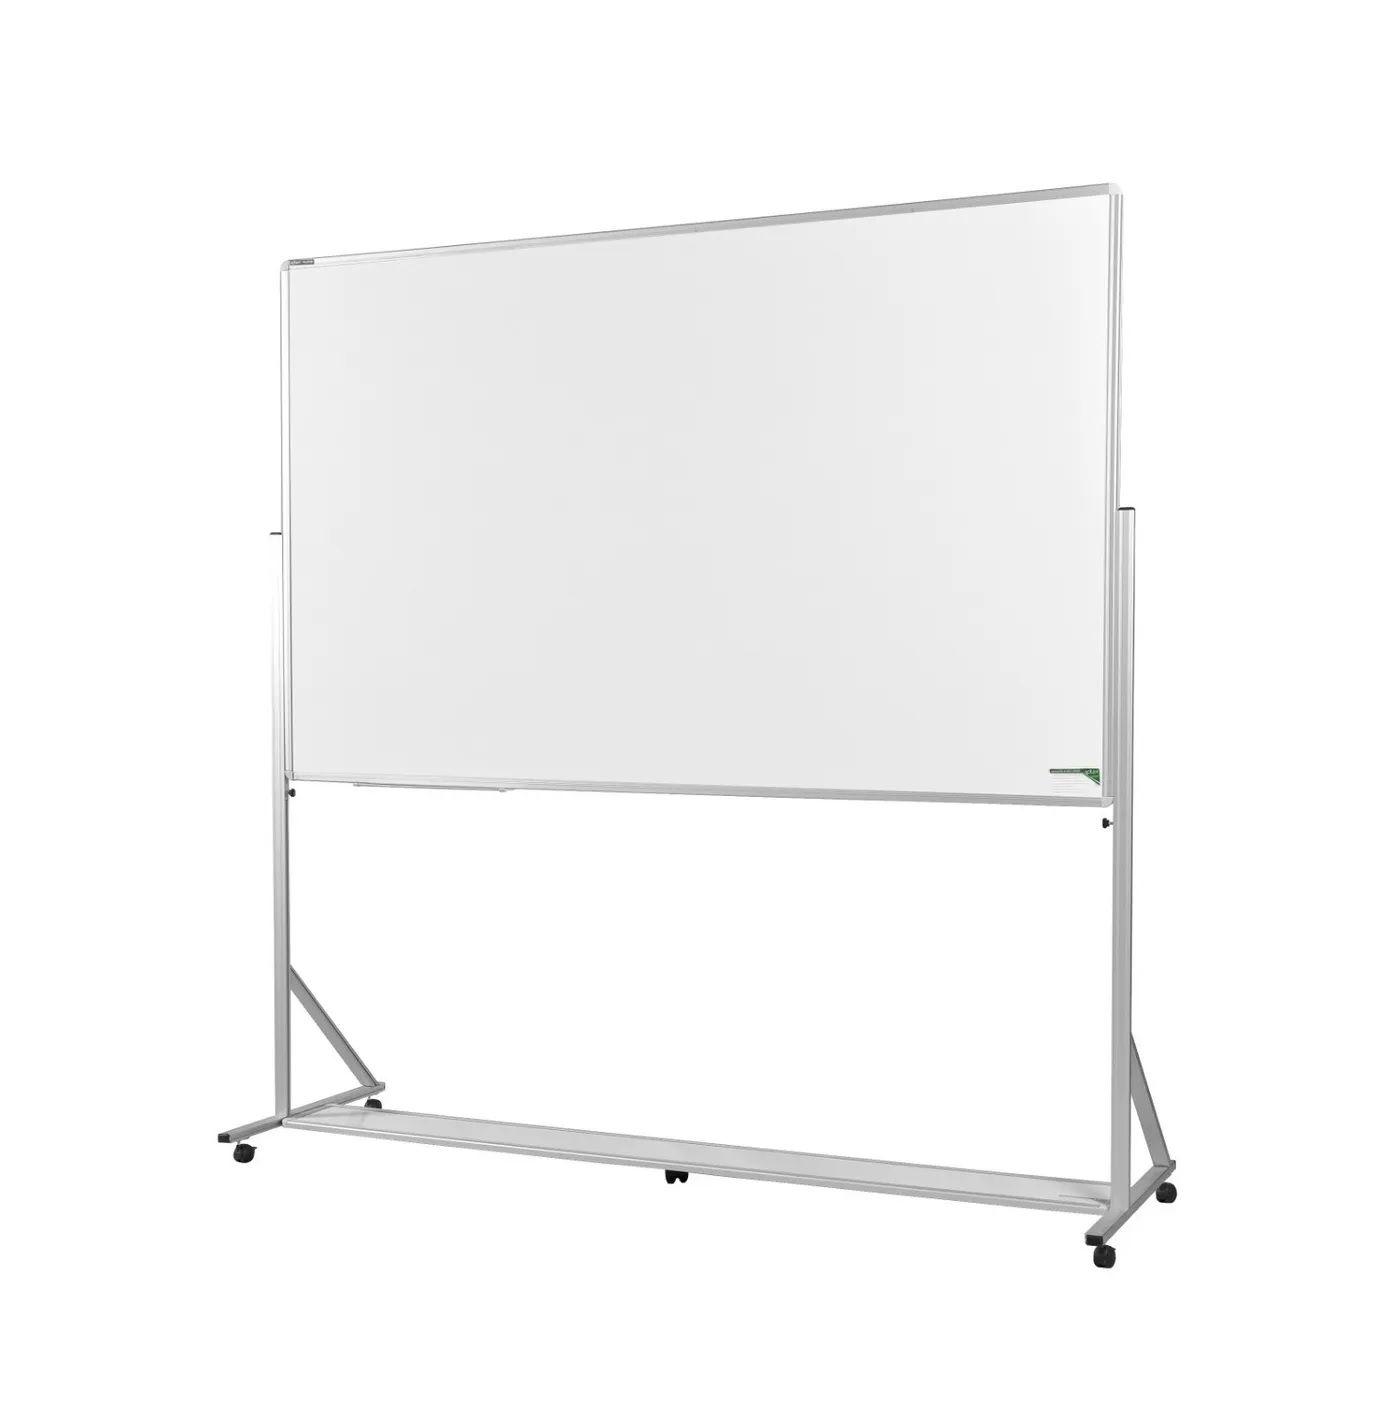 Cavalete Porta Quadro 120x90 cm Alumínio Luxo com Quadro Branco Incluso - Souza 2408